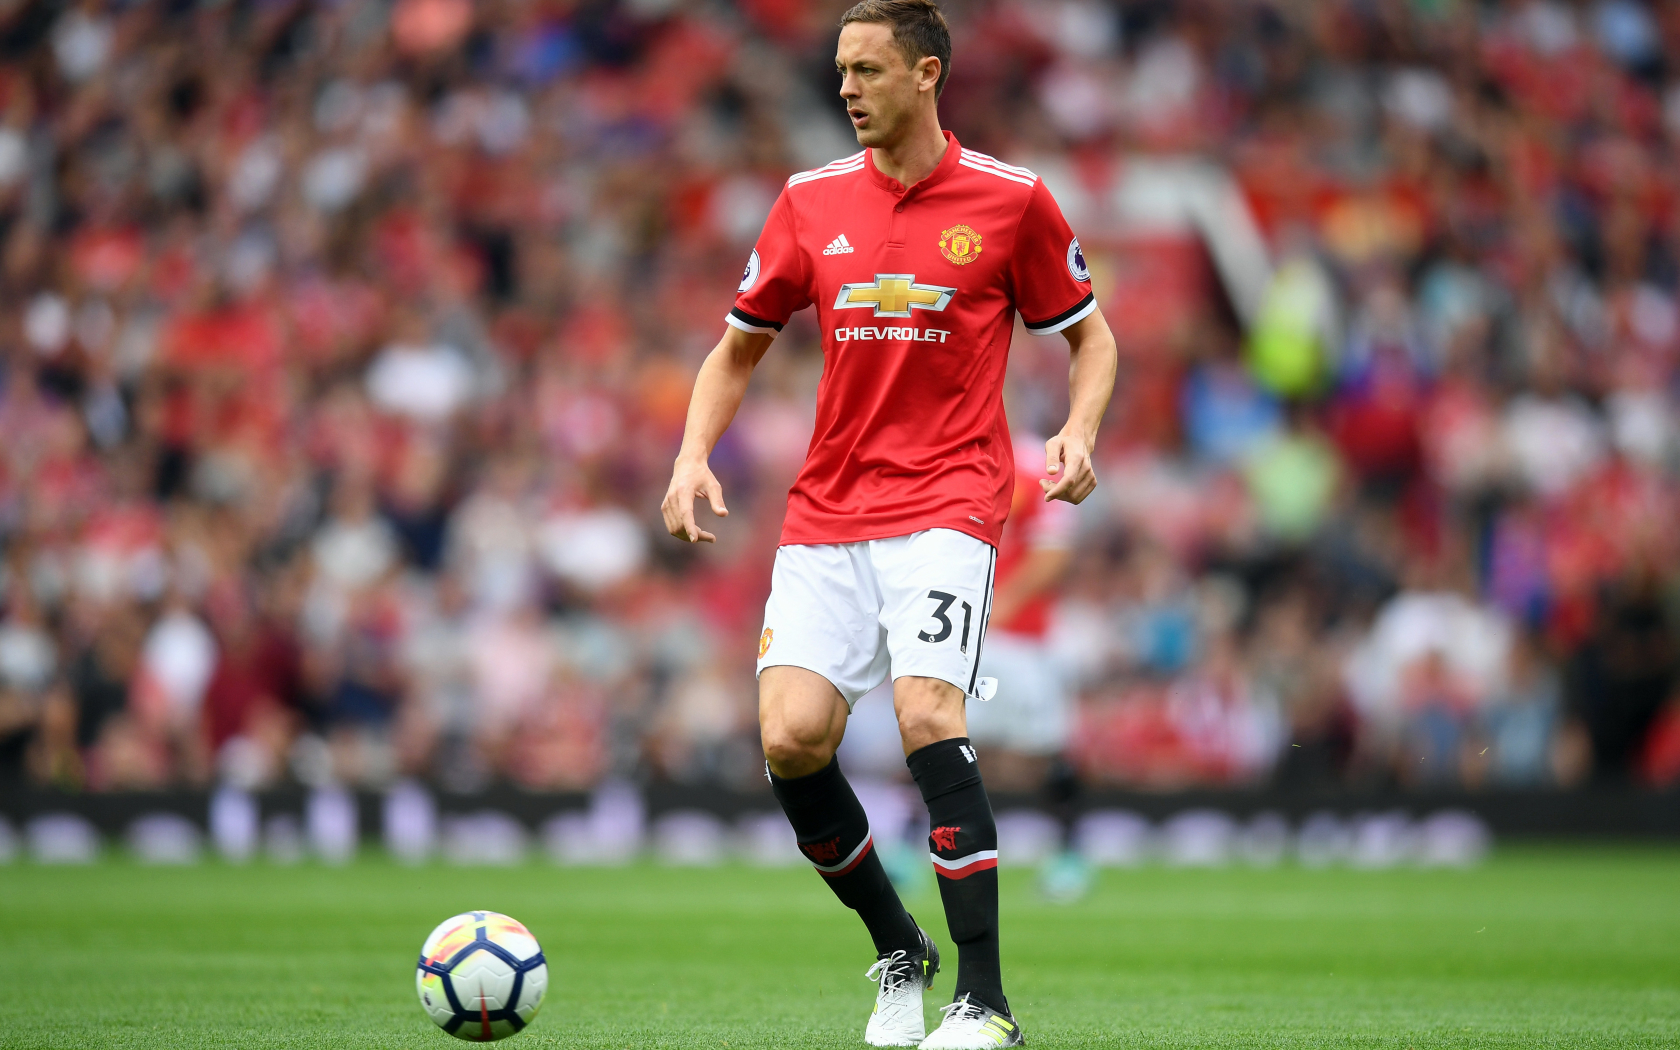 Nemanja Matic Manchester United Football Player Hd 4k